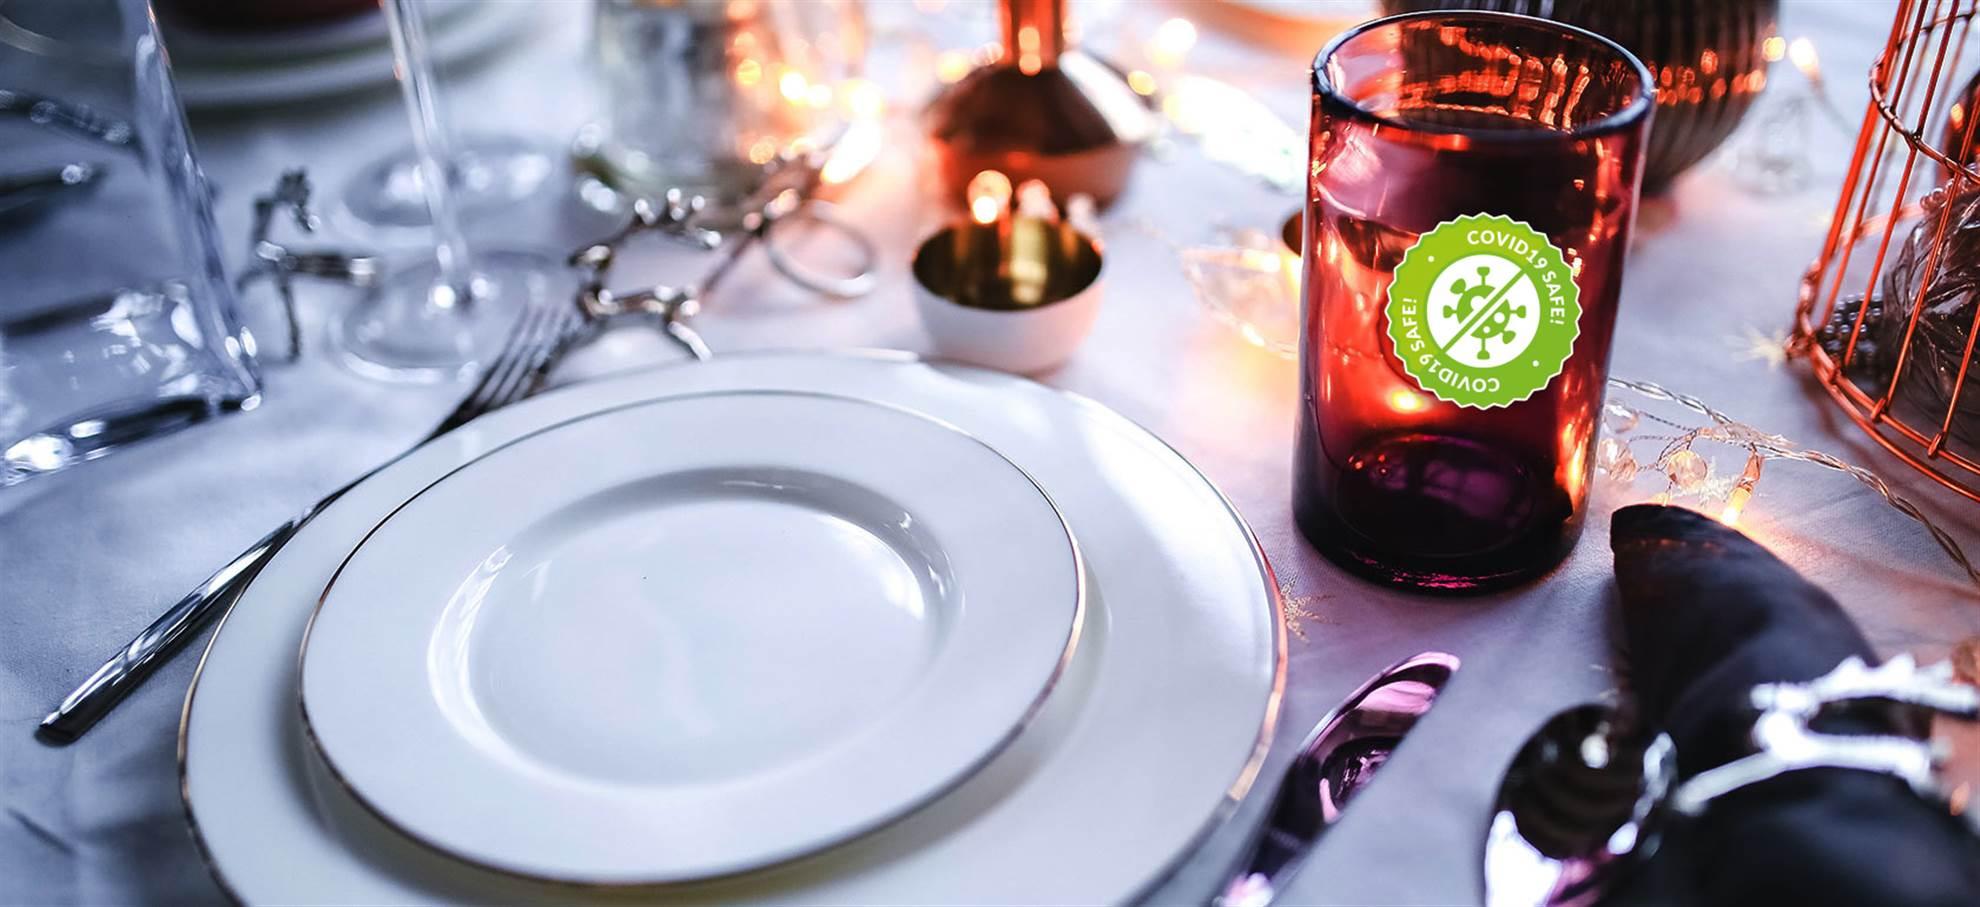 Dinner-Fahrt